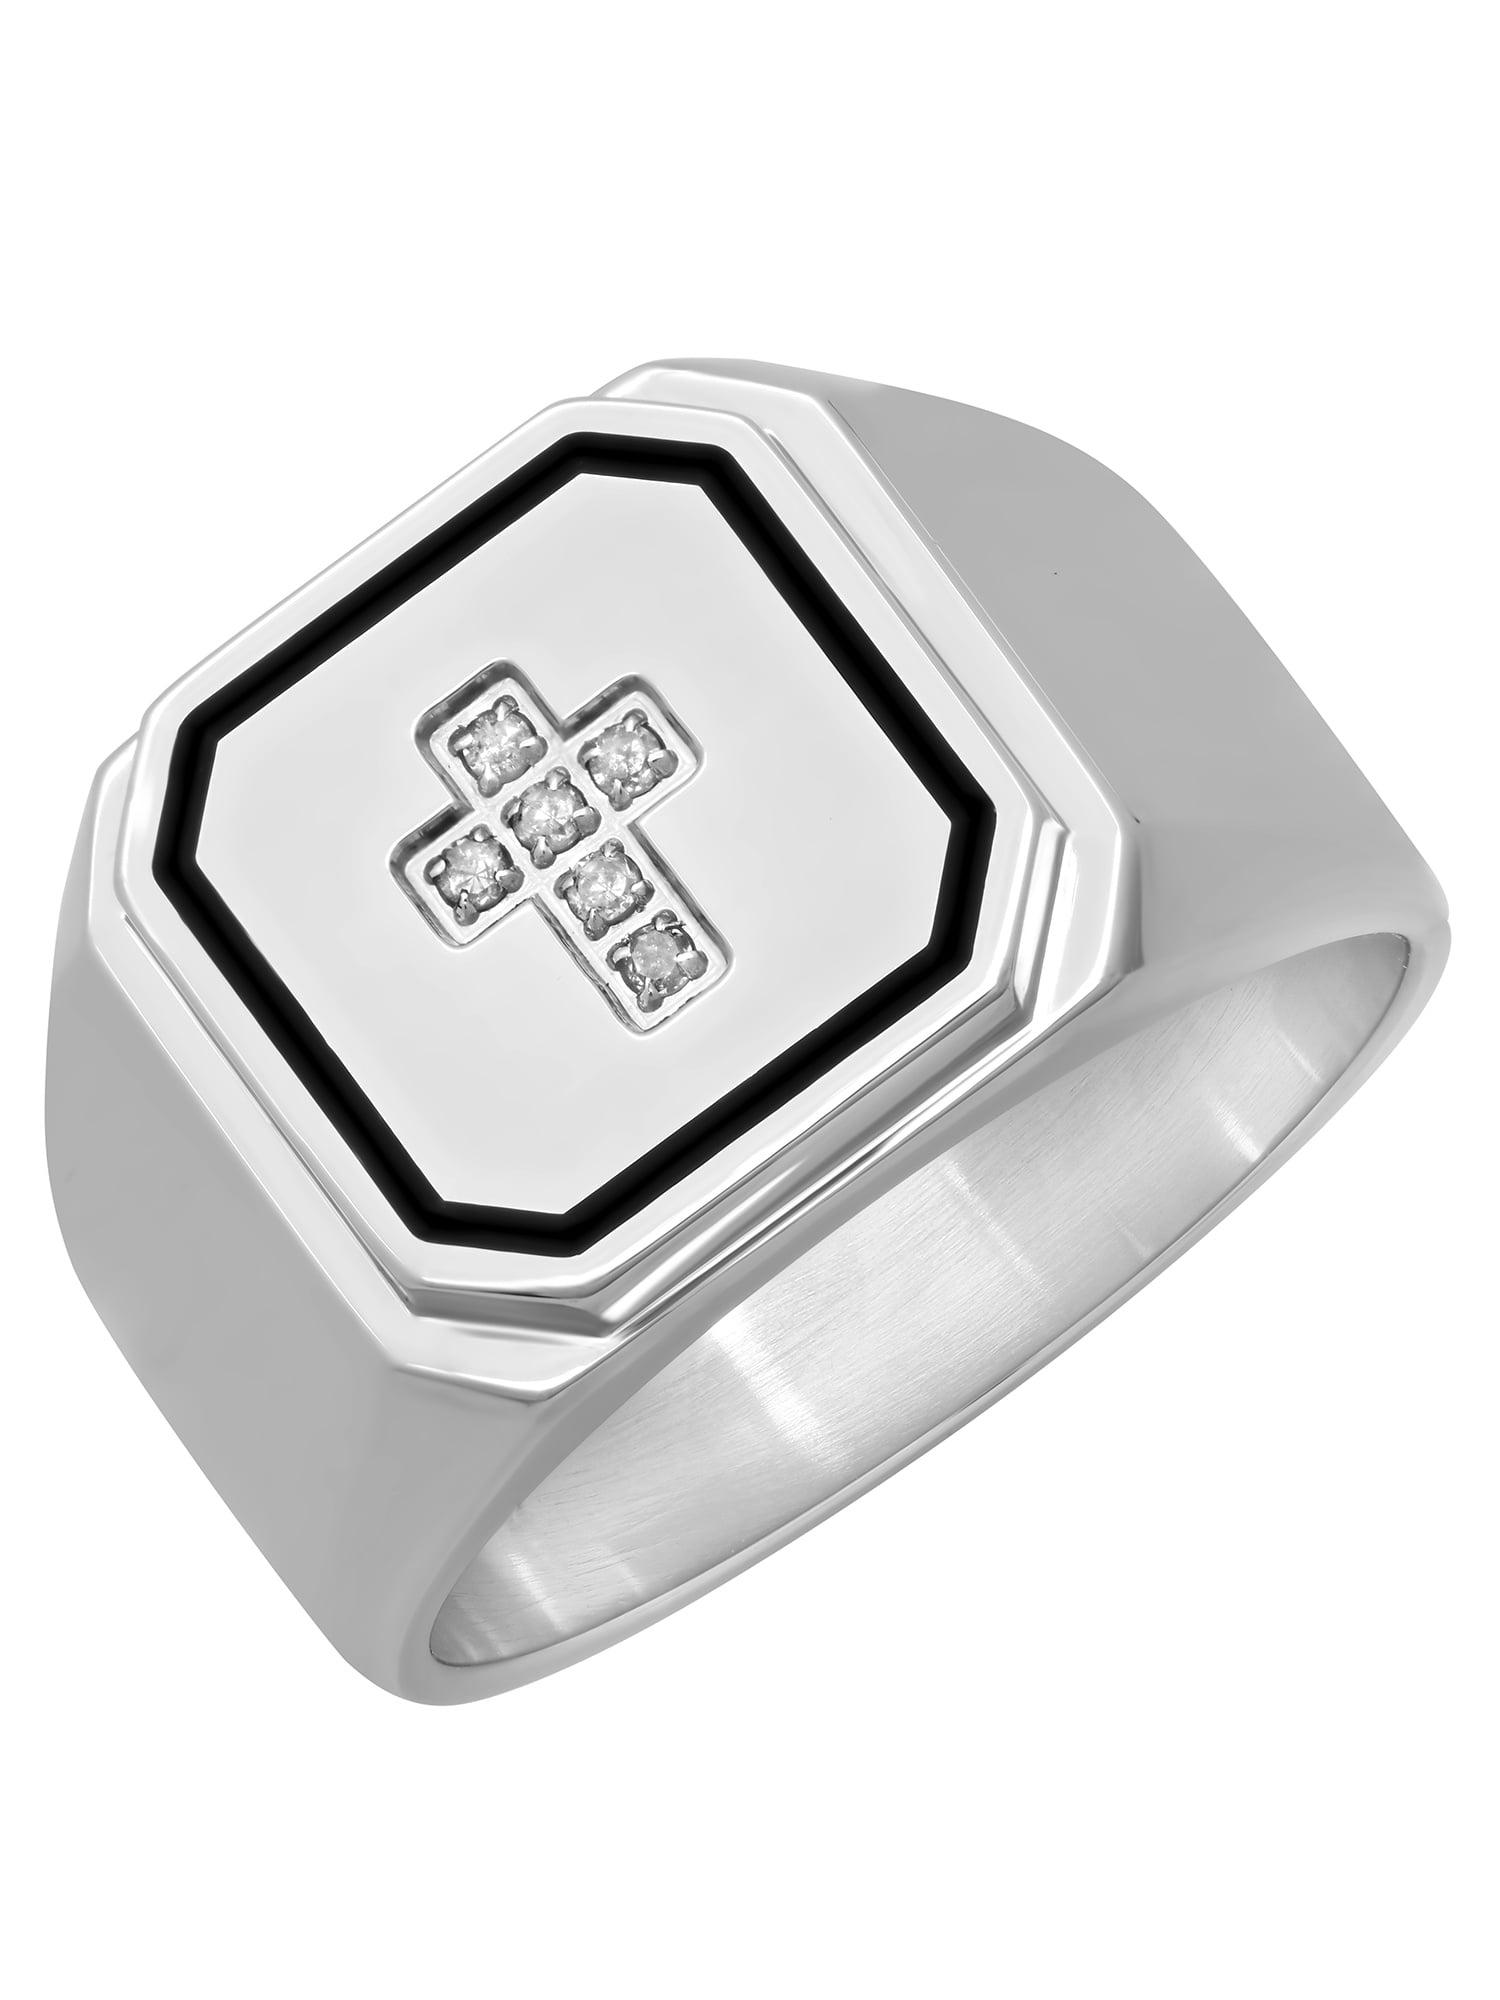 Men's Stainless Steel 8MM Diamond Accent Cross Wedding Band - Mens Ring